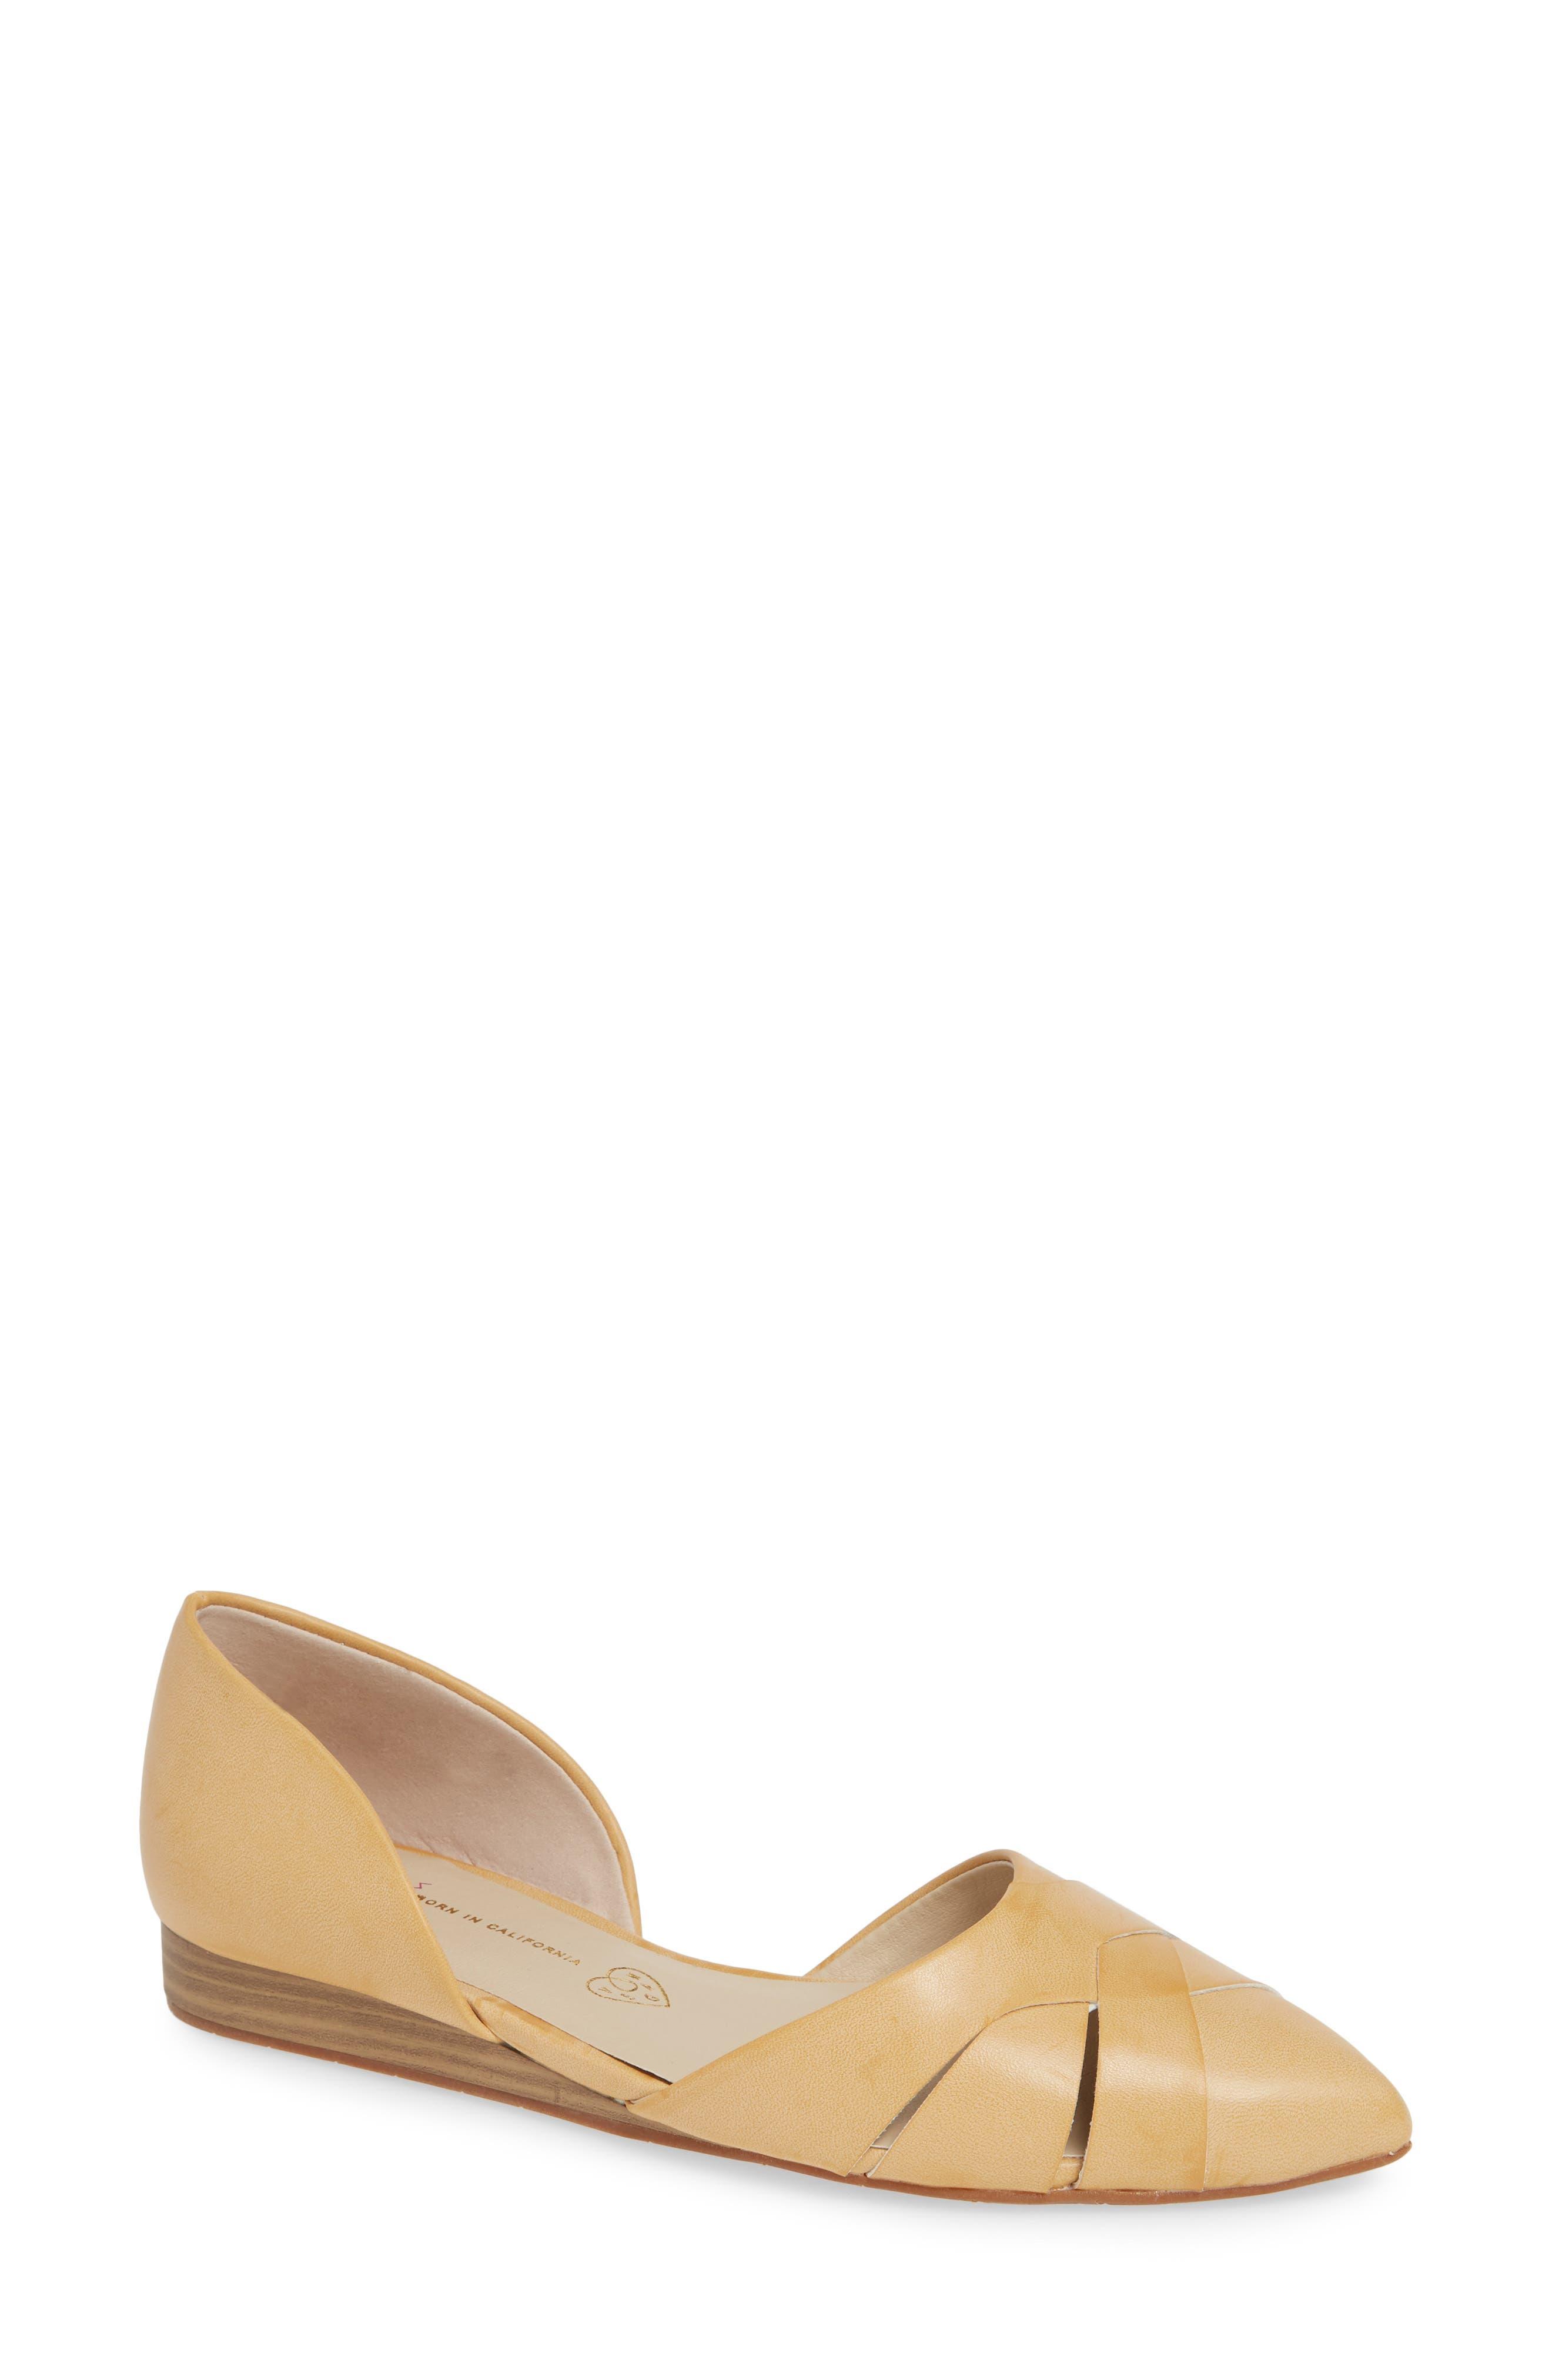 Bc Footwear Focal Point Vegan Pointy Toe Flat, Beige